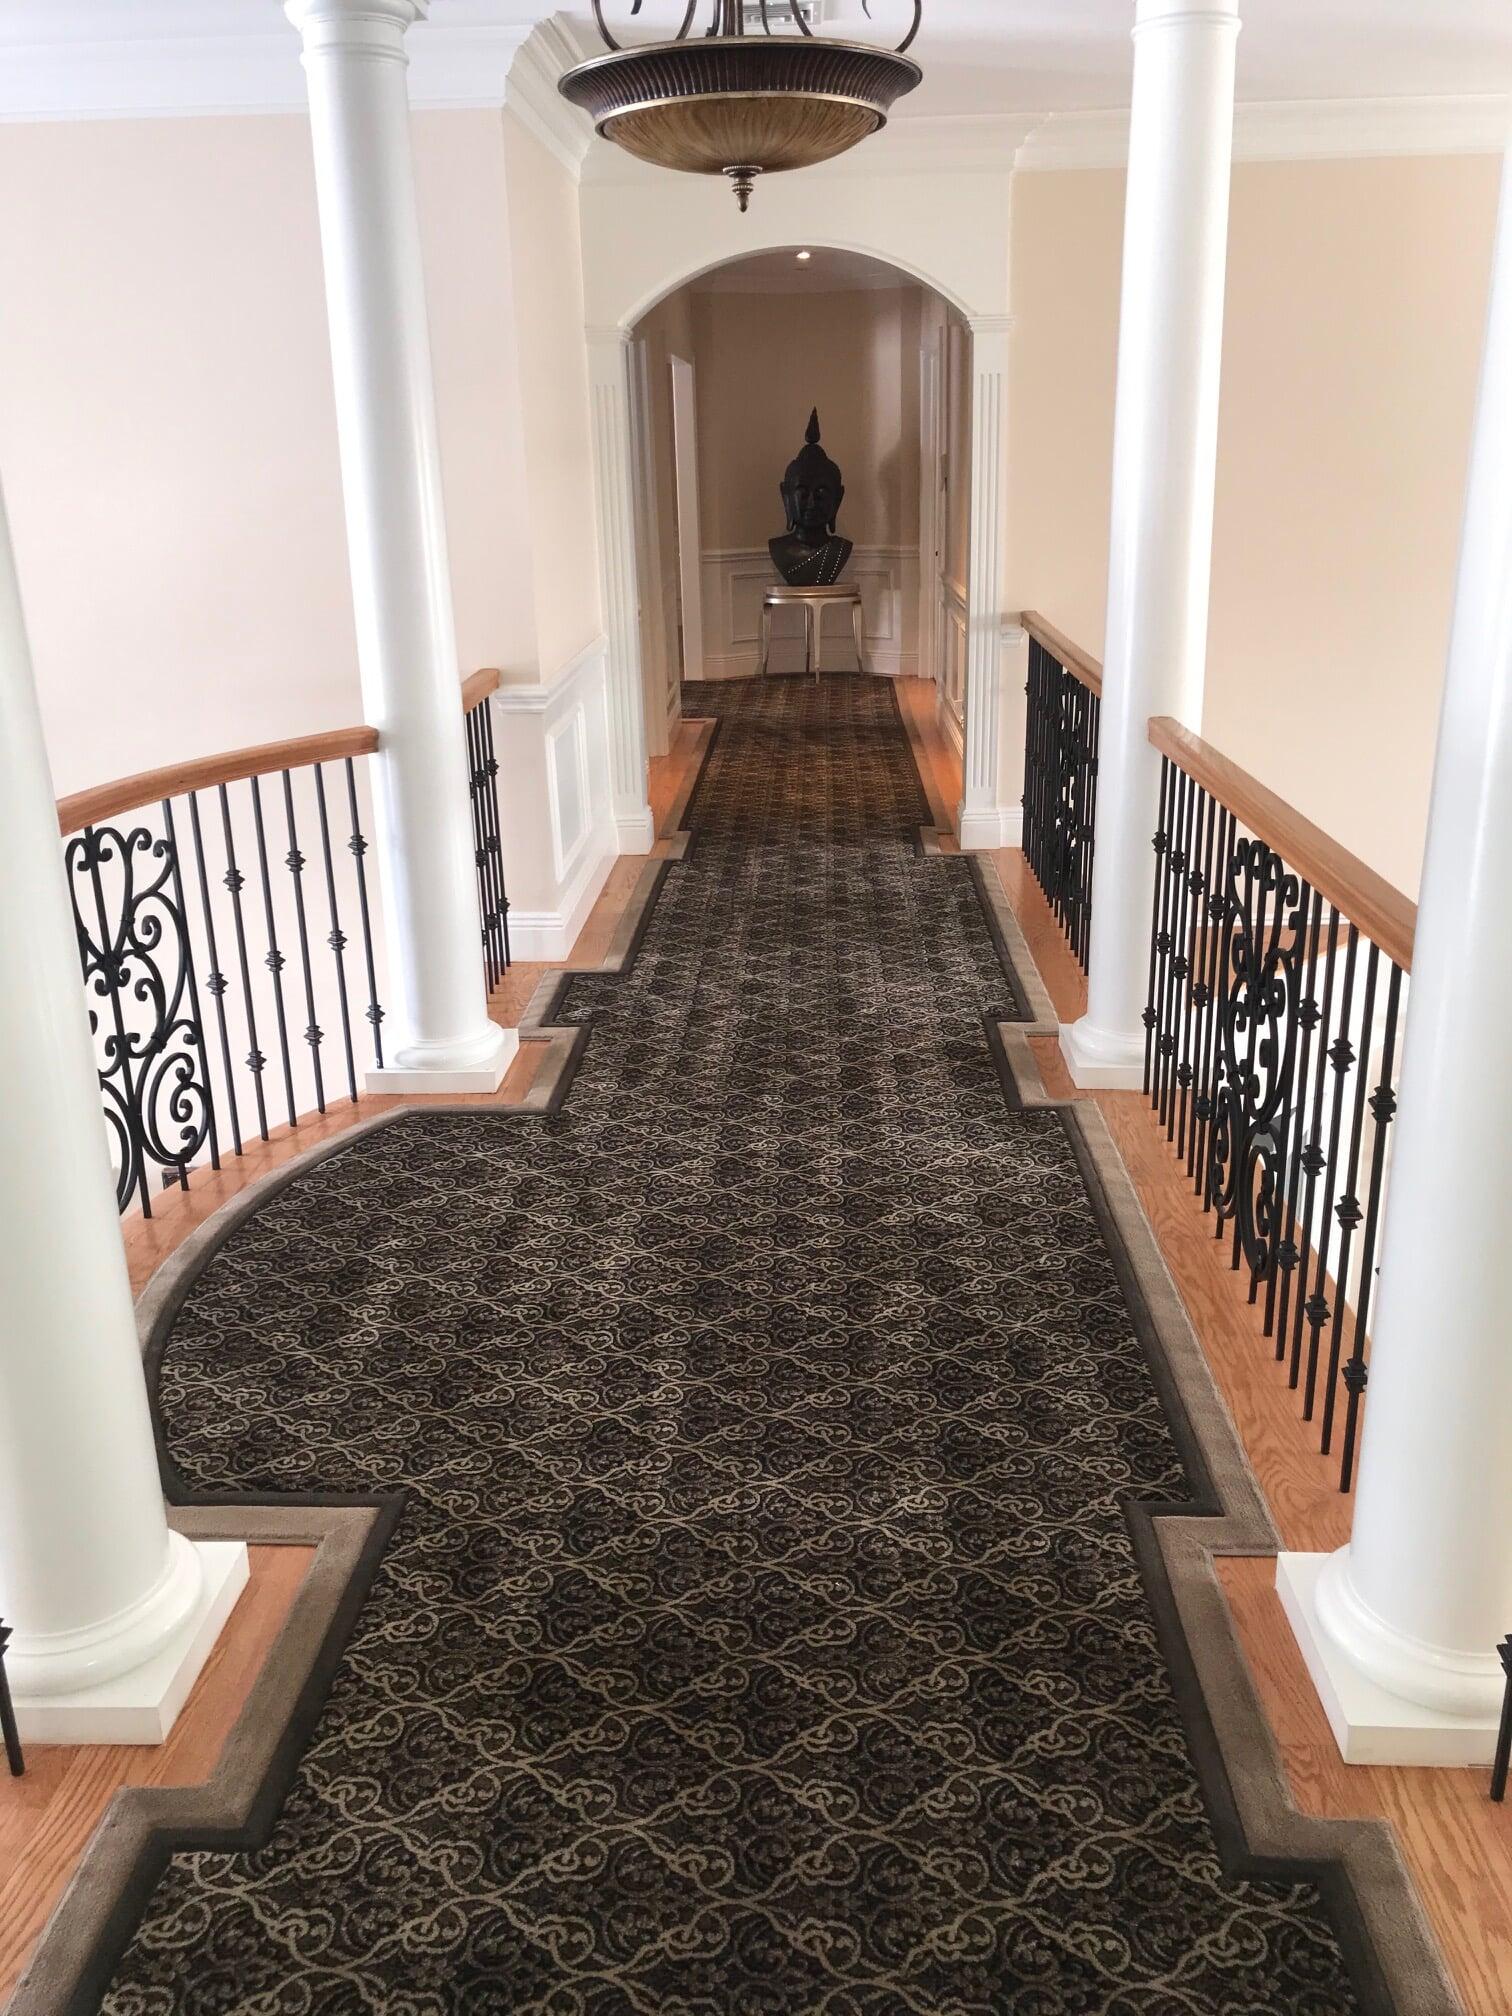 Custom hallway runner in Paramus, NJ from G. Fried Flooring & Design